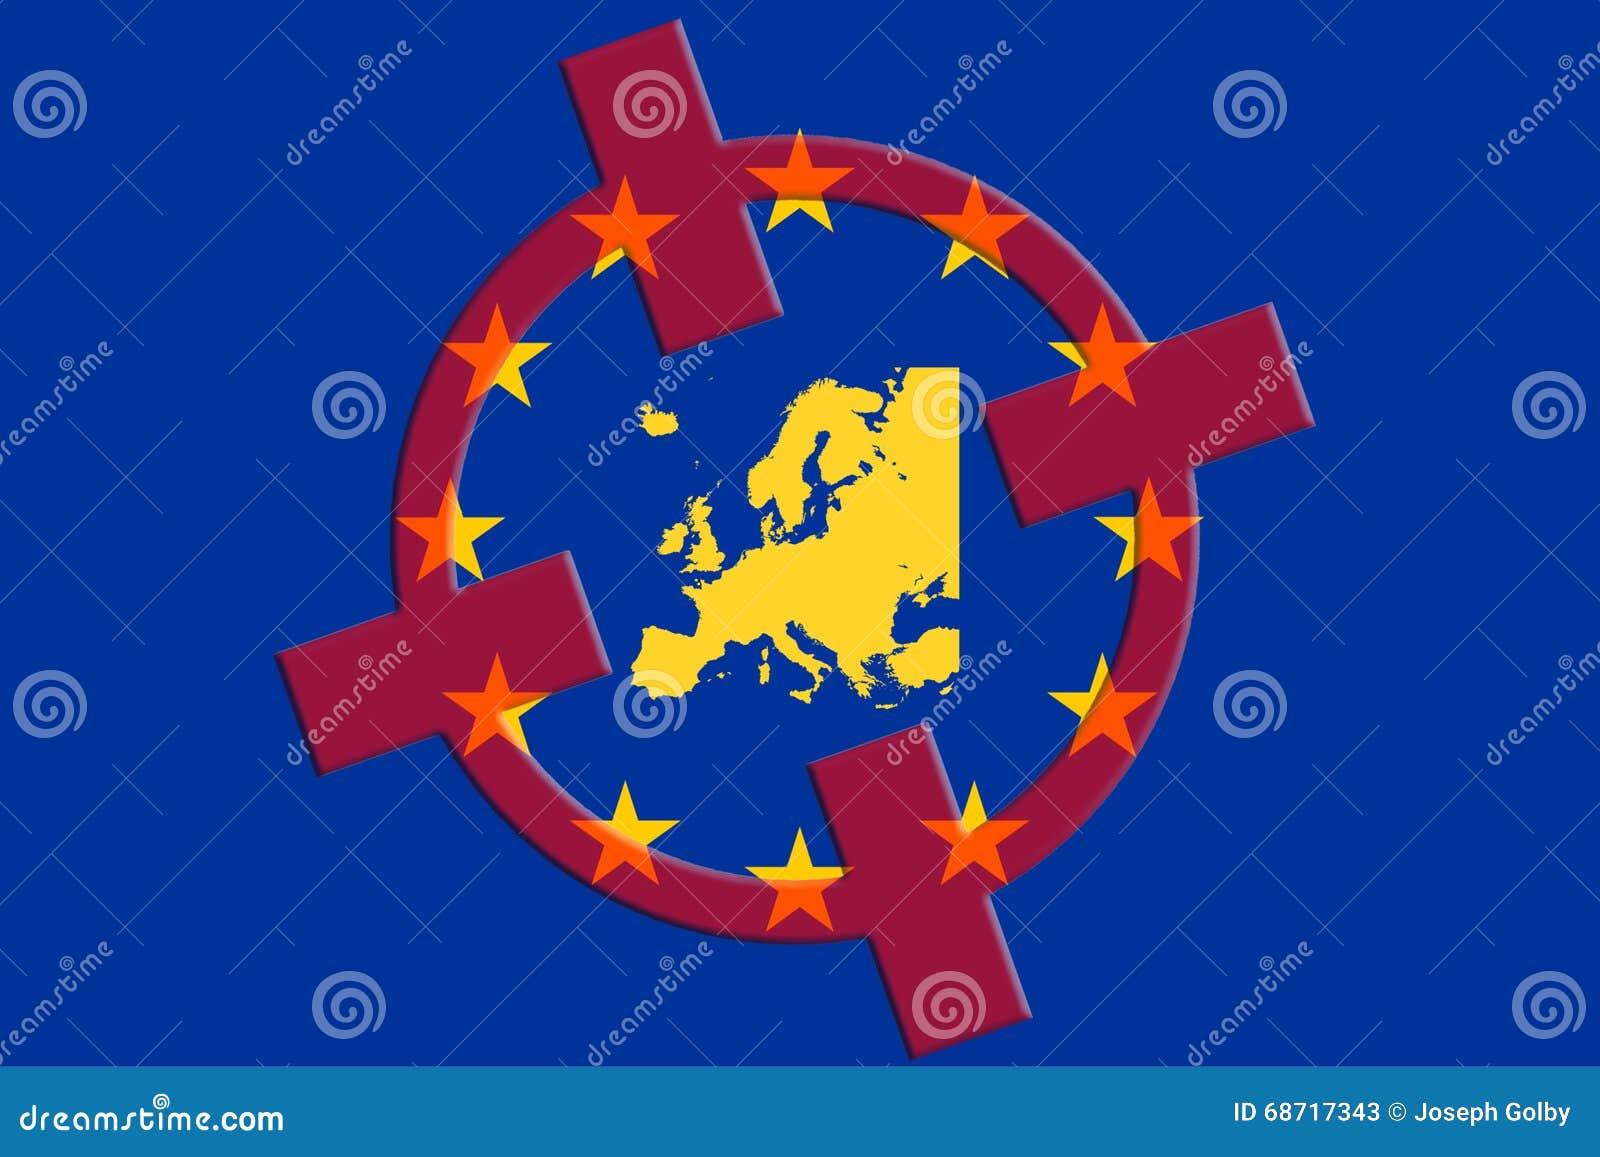 terrorism concept europe eu terror target eu flag red crosshair map